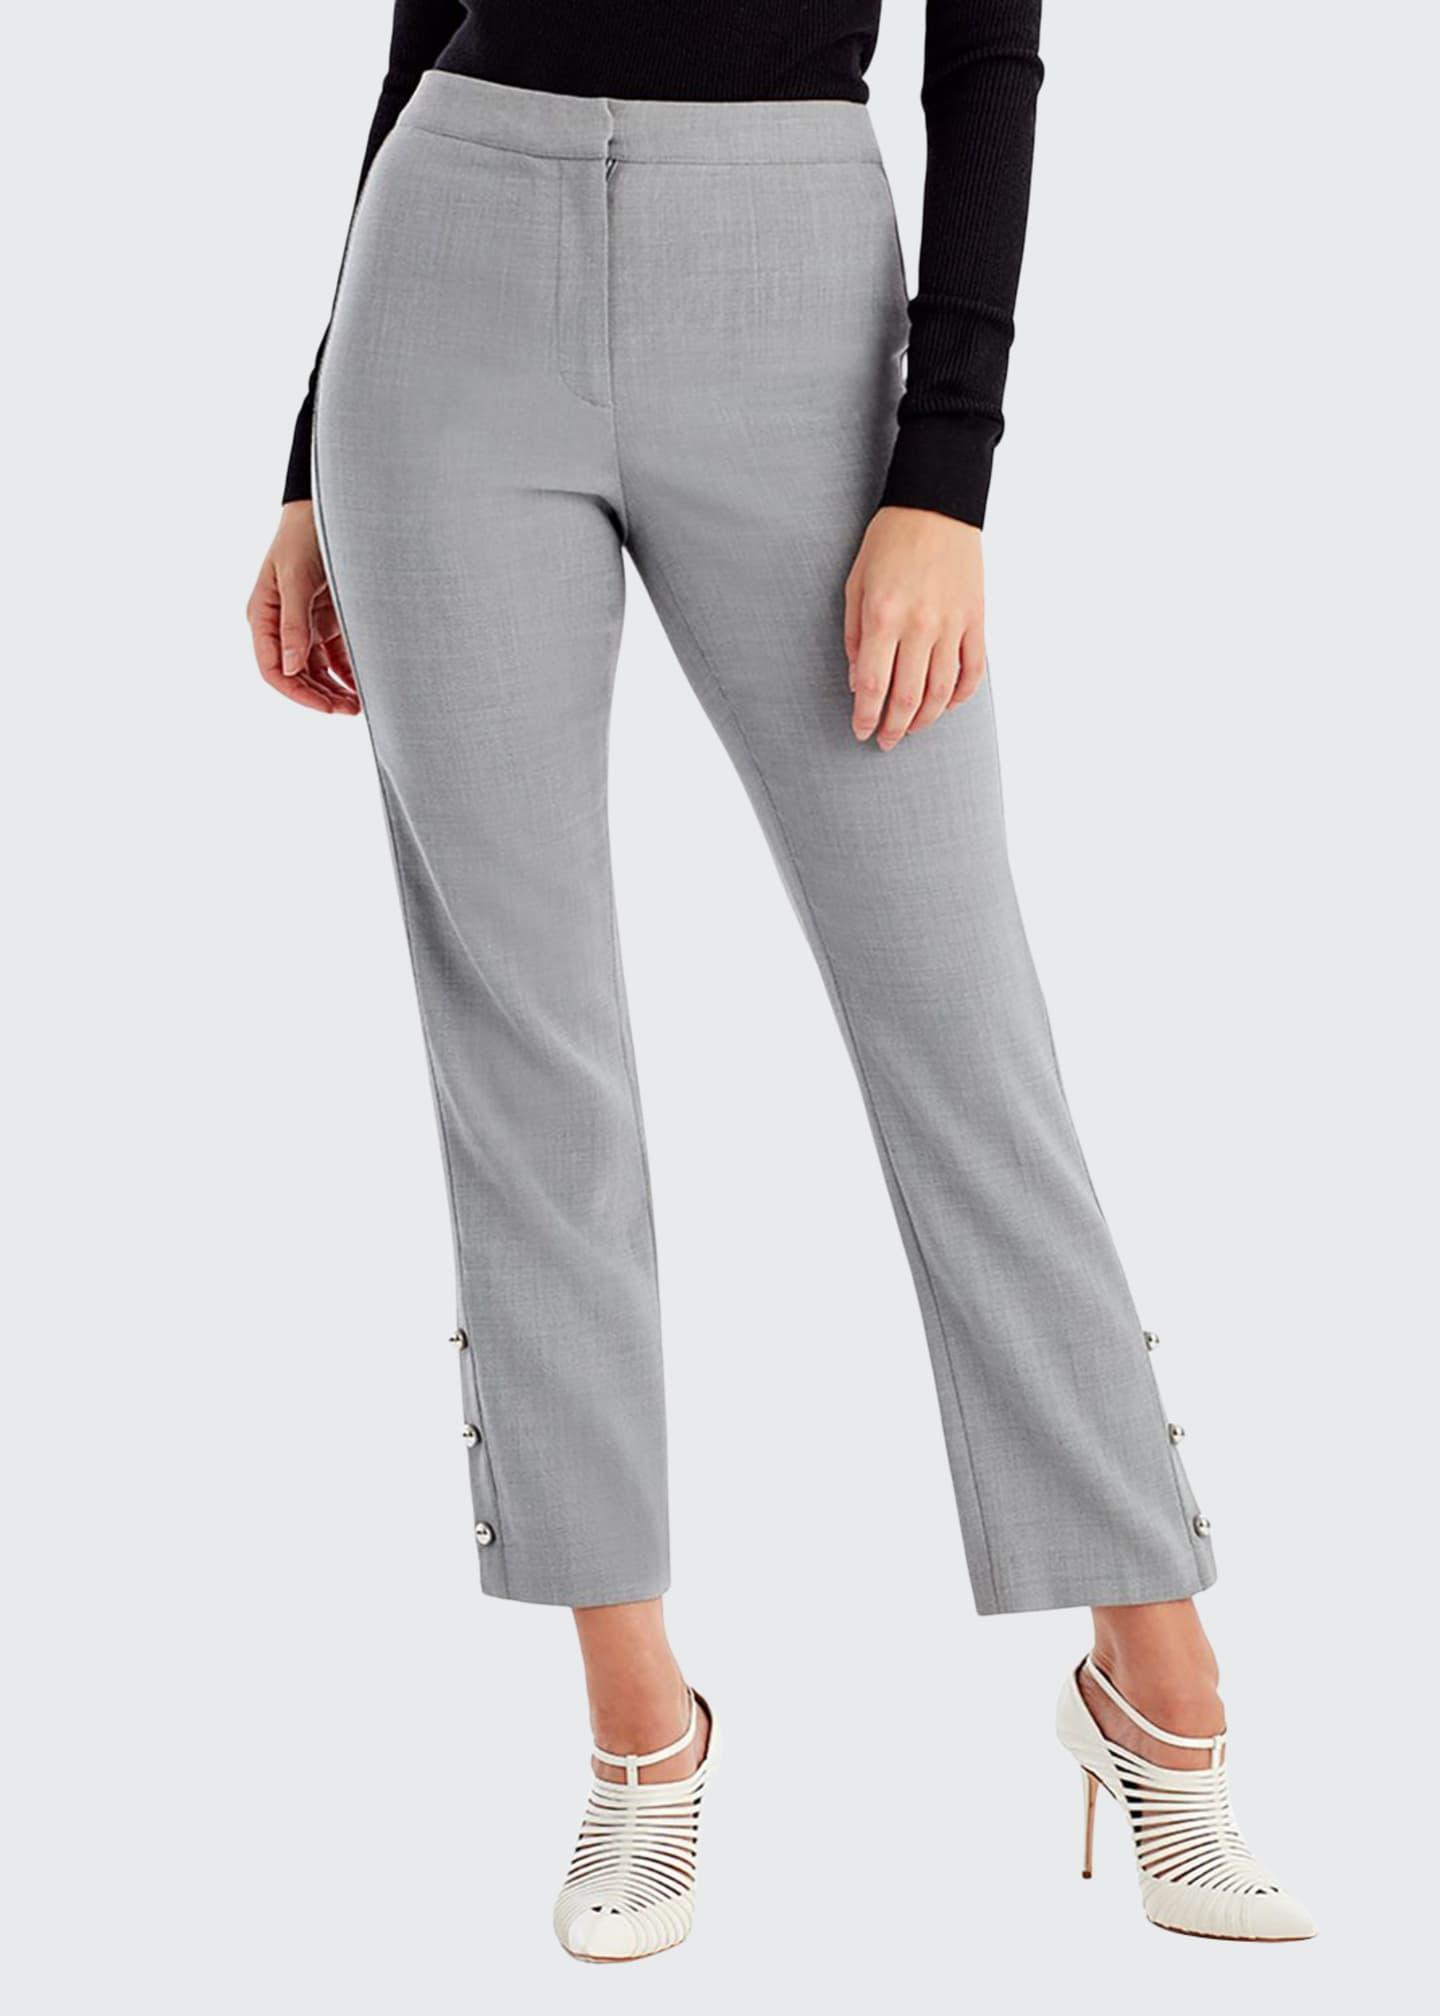 Jason Wu Straight-Leg Crop Pants with Button Trim